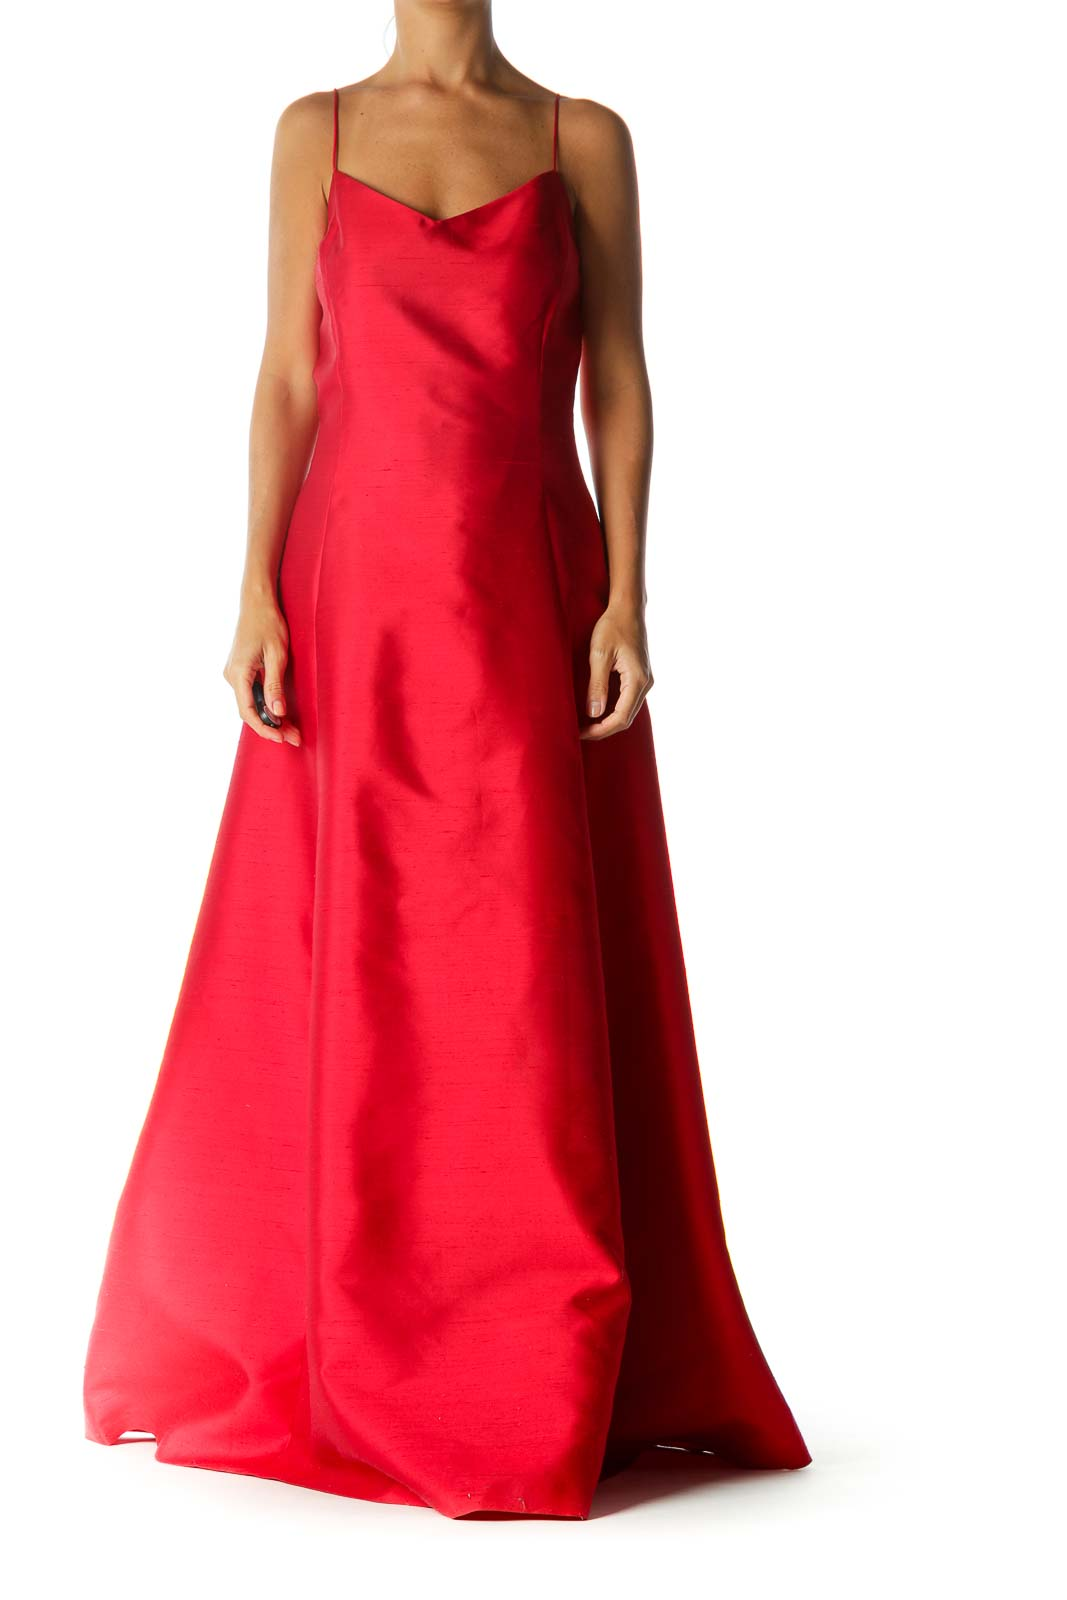 Red Silk Blend Sweetheart Neckline Spaghetti Strap Back V-Neck Evening Dress